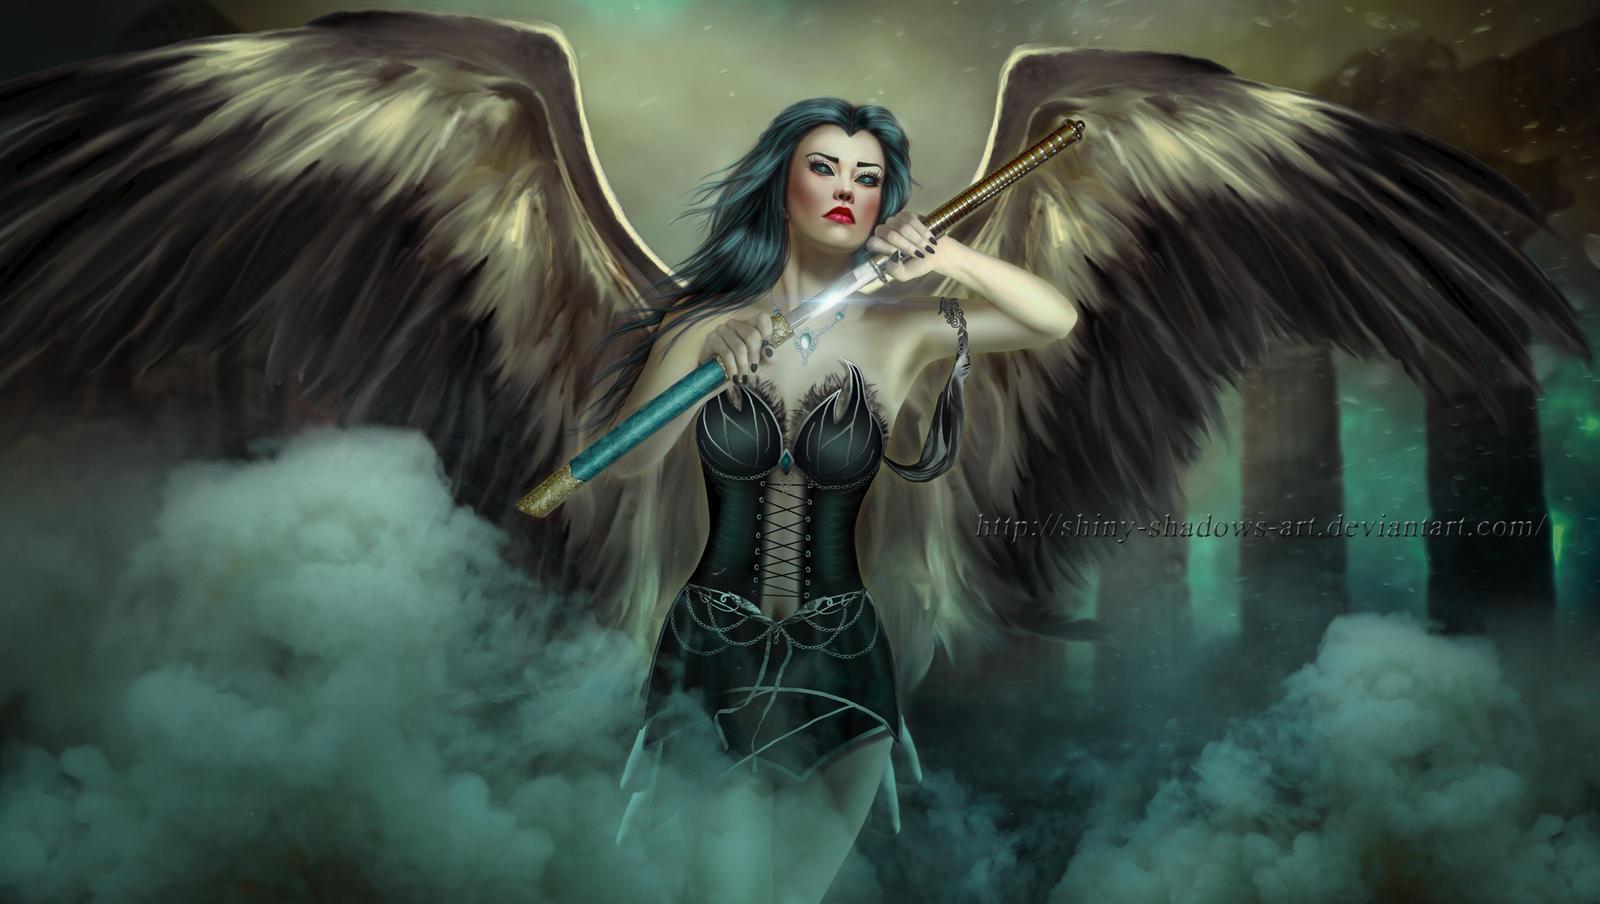 Angelarium by shiny-shadows-Art